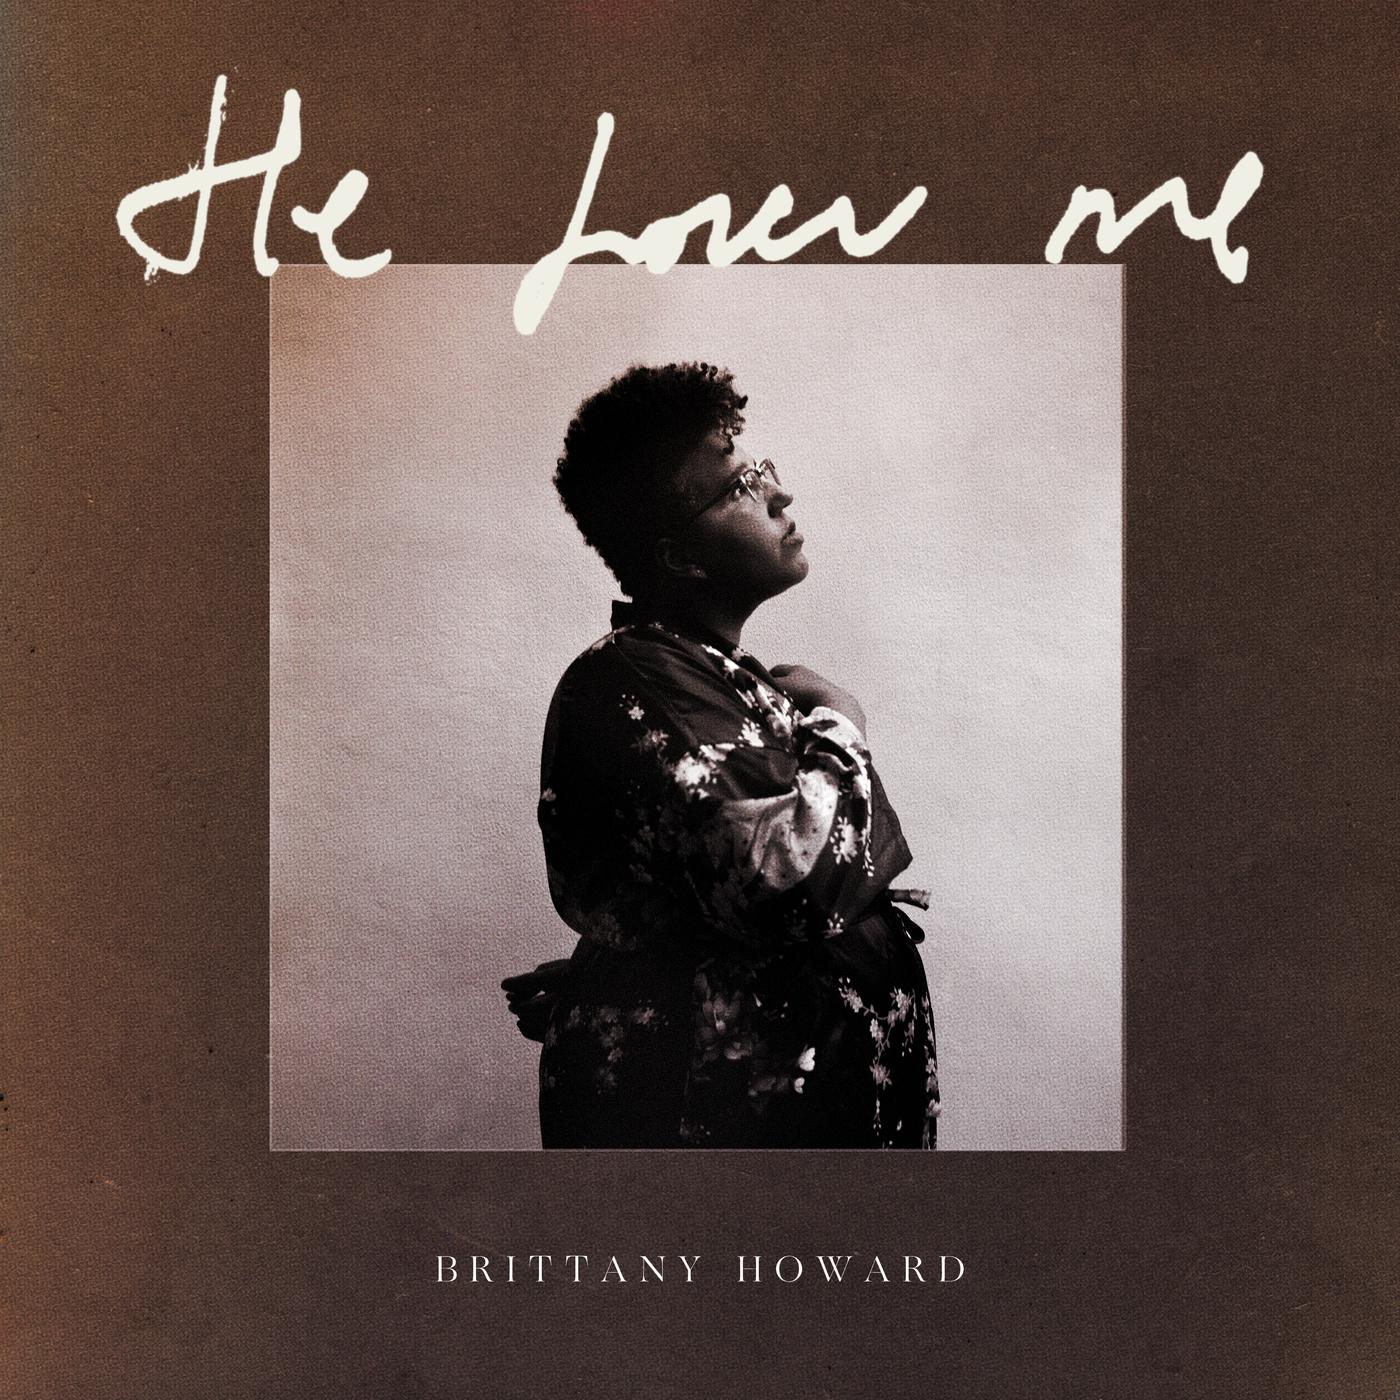 He Loves Me - Brittany Howard